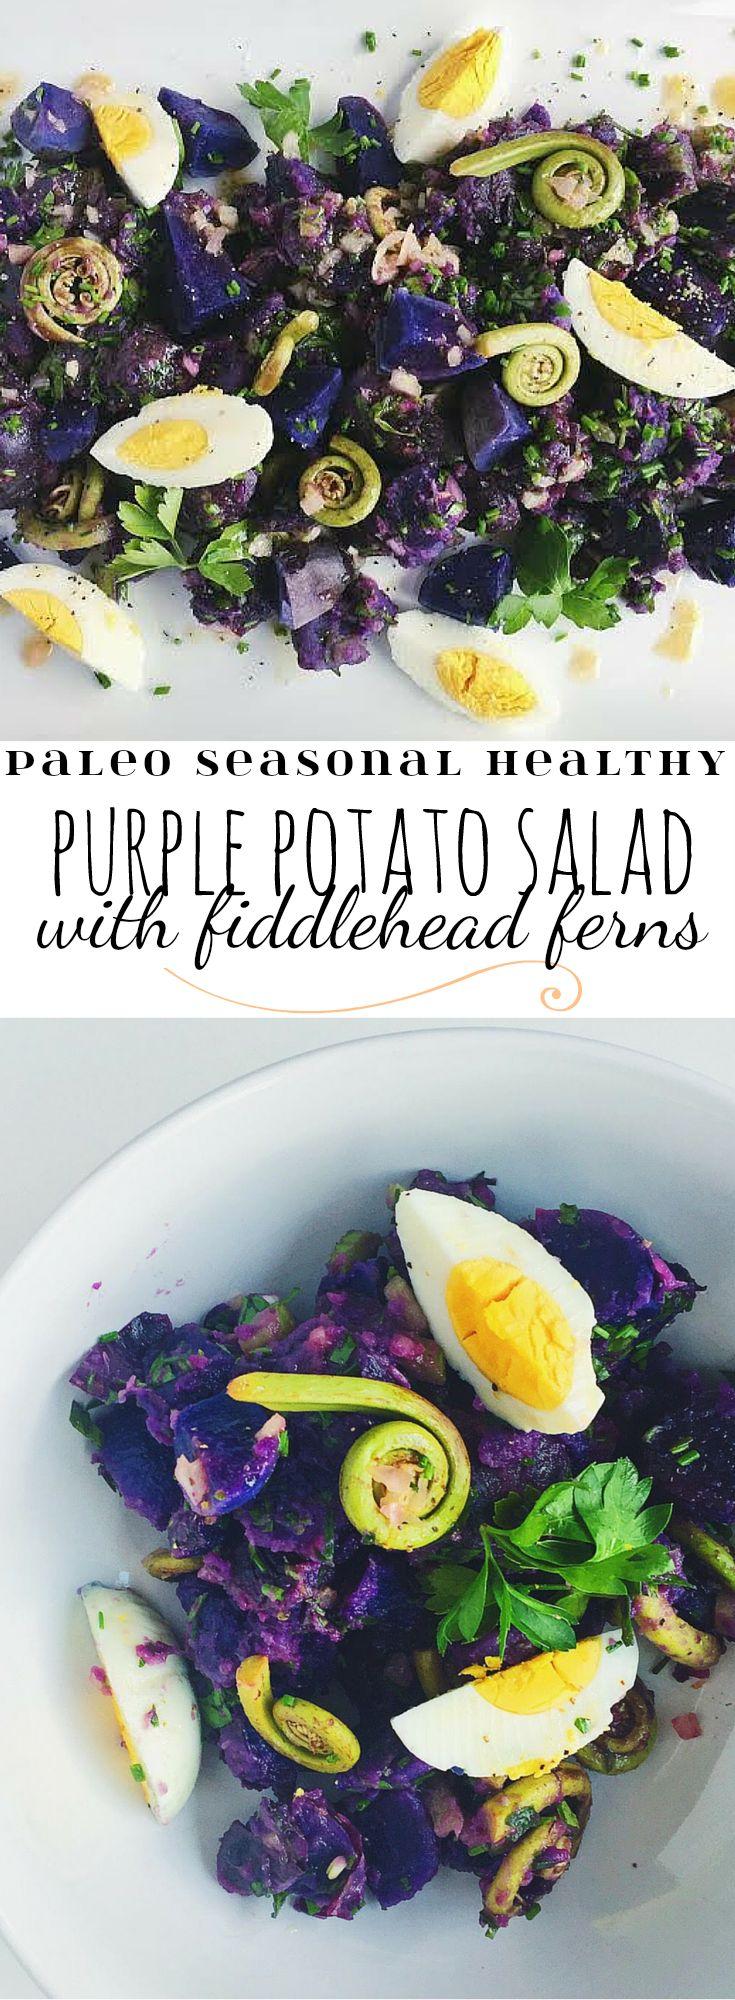 Seasonal purple potato salad with fiddlehead ferns and a lemony vinaigrette!